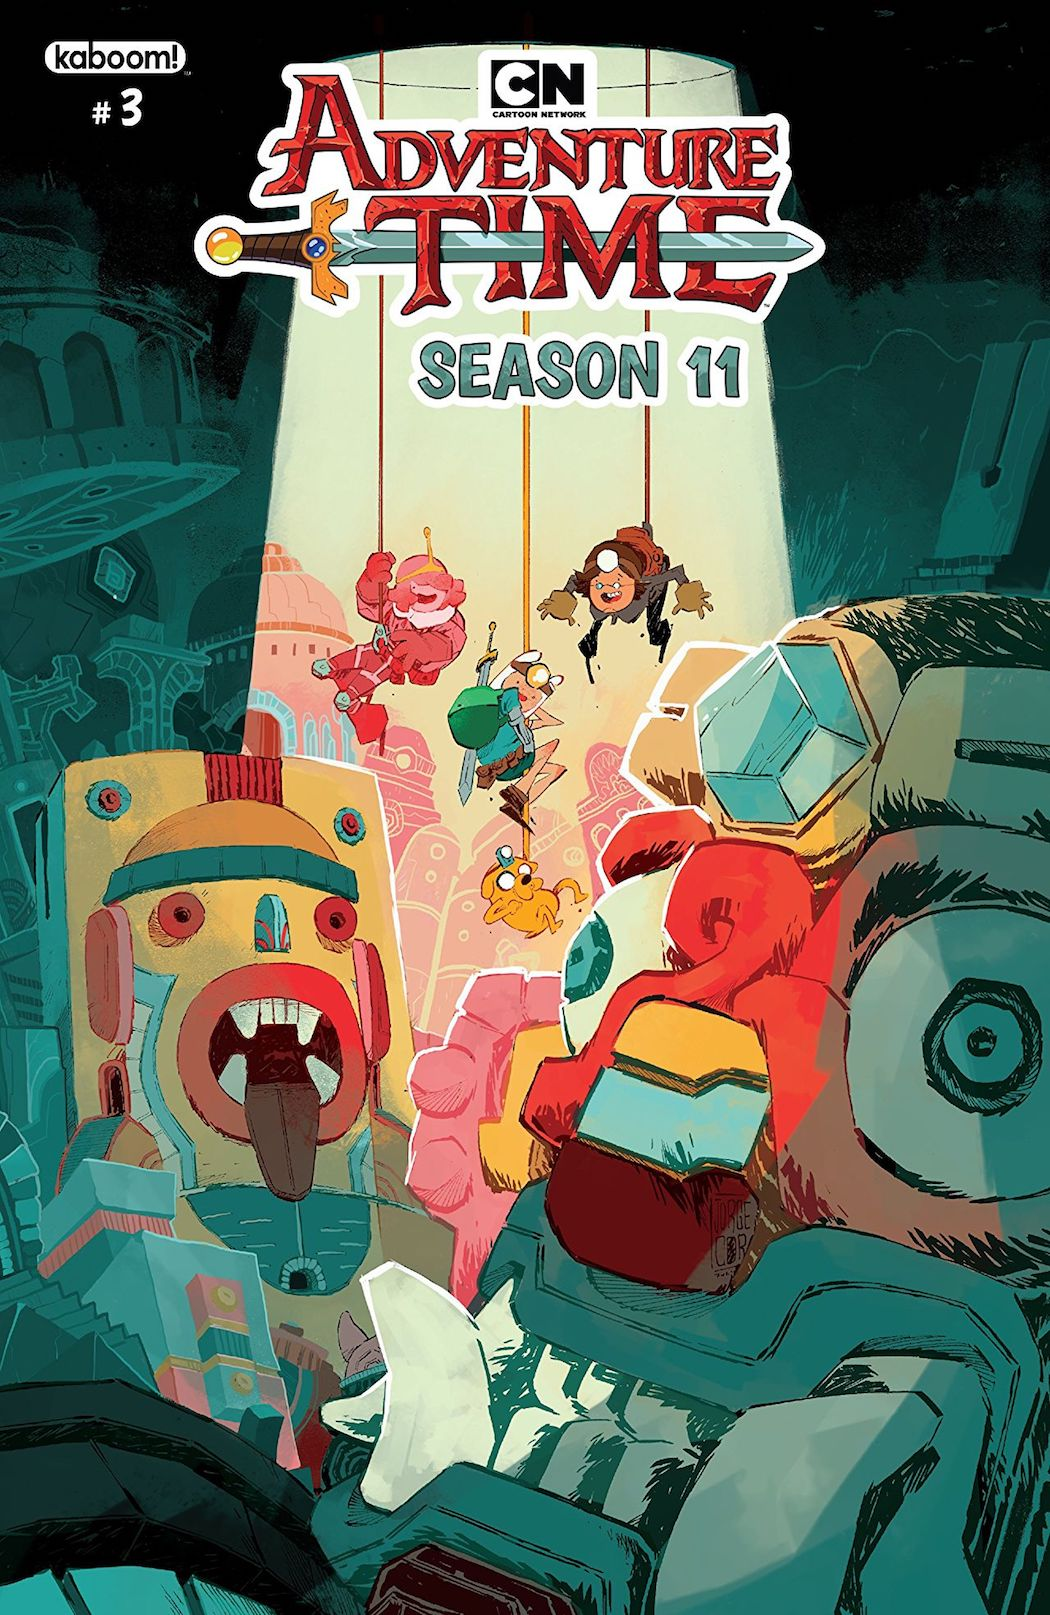 30a2c623908d8d Adventure Time Season 11 cover by Jorge Corona (Credit Cartoon Network)